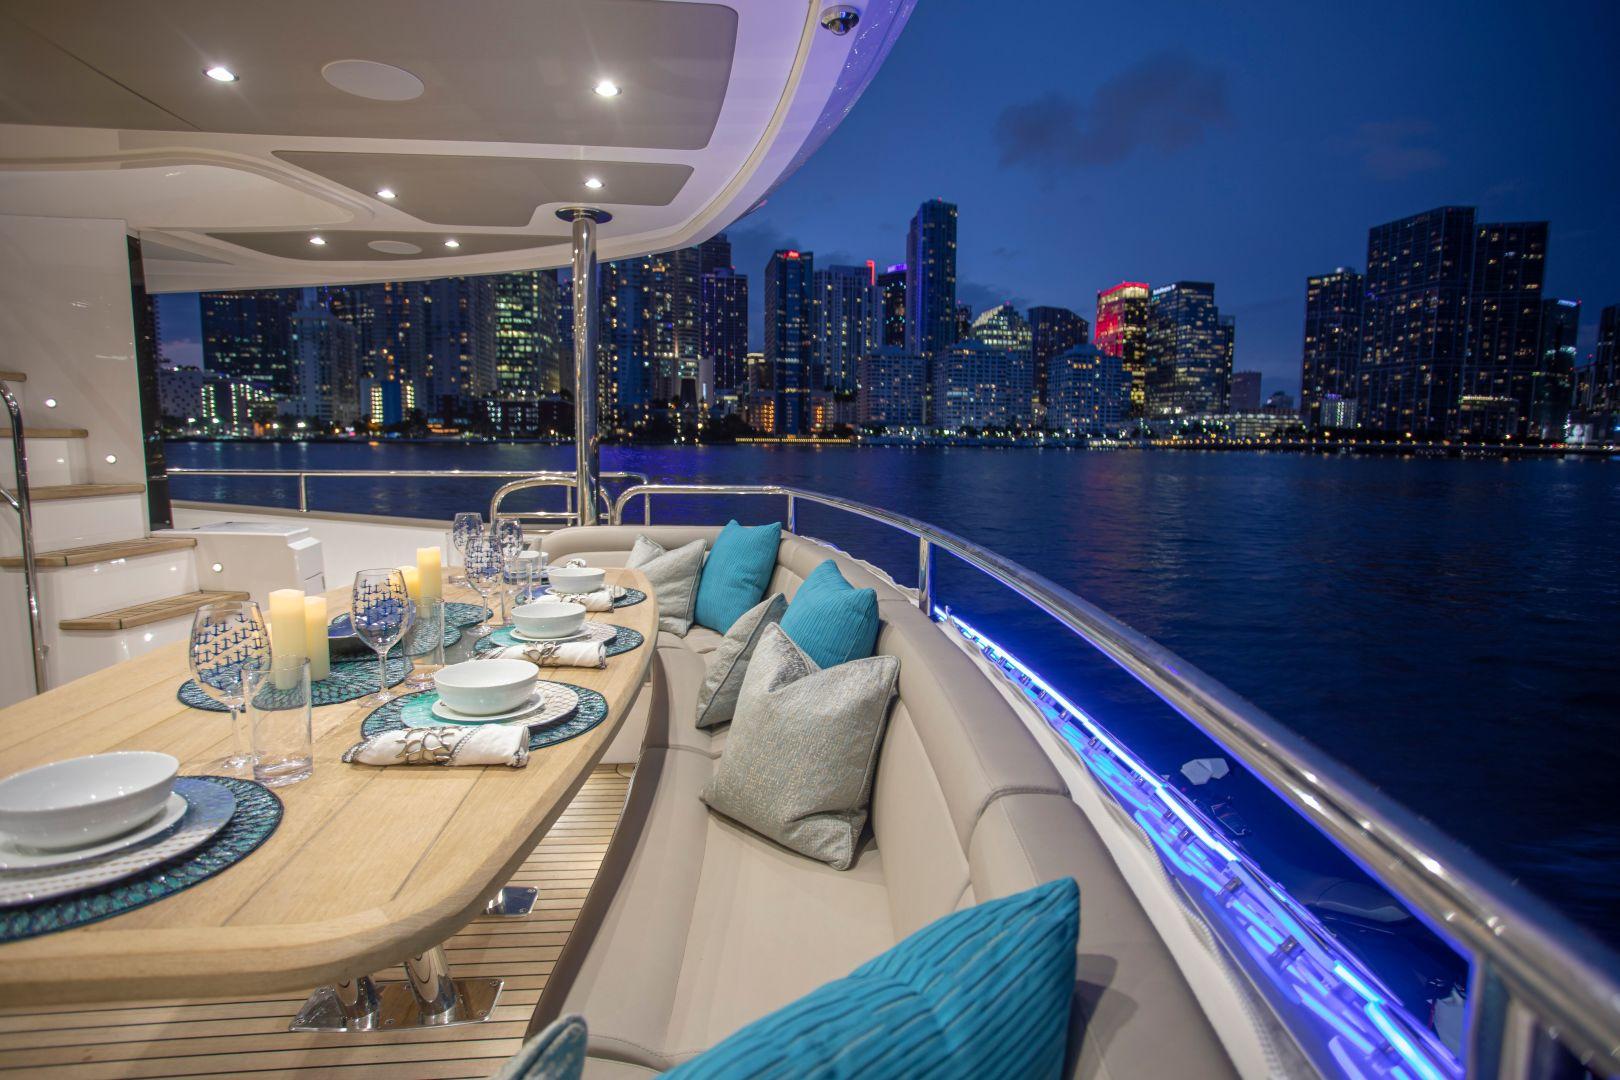 Sunseeker-95 Yacht 2017-Perseverance 3 Ft Lauderdale-Florida-United States-1400073   Thumbnail